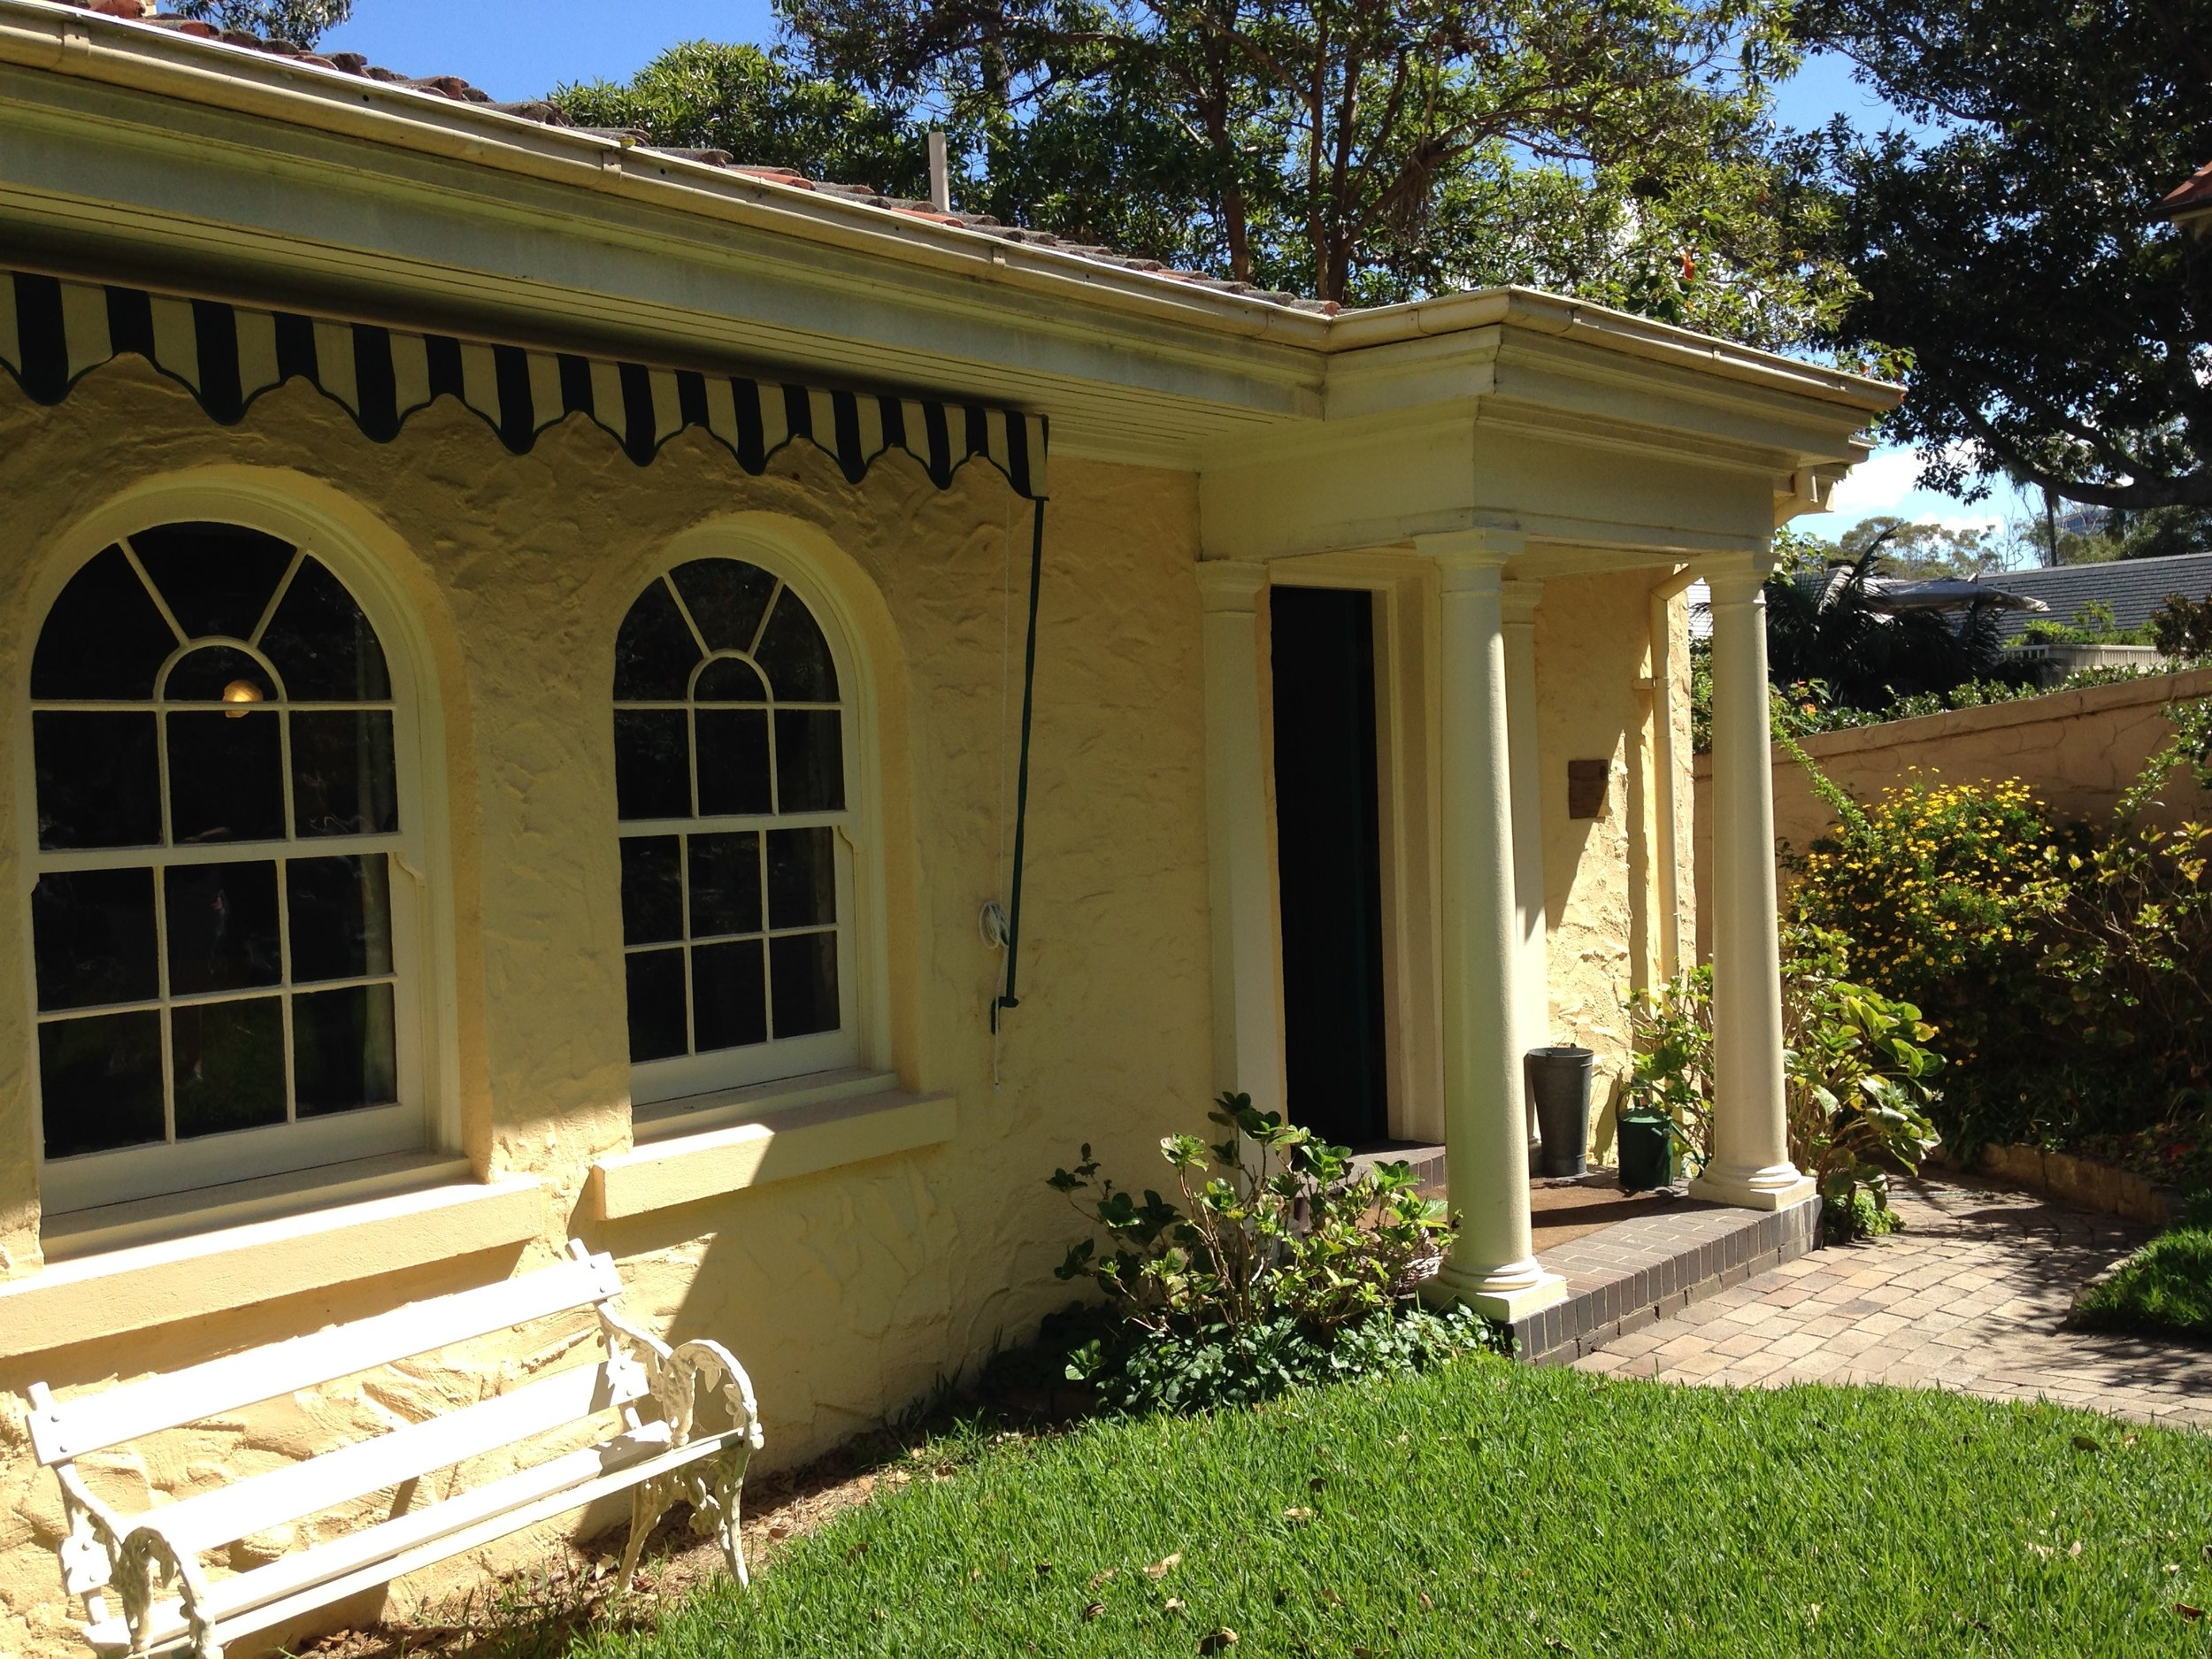 May Gibbs' home Nutcote in Neutral Bay.